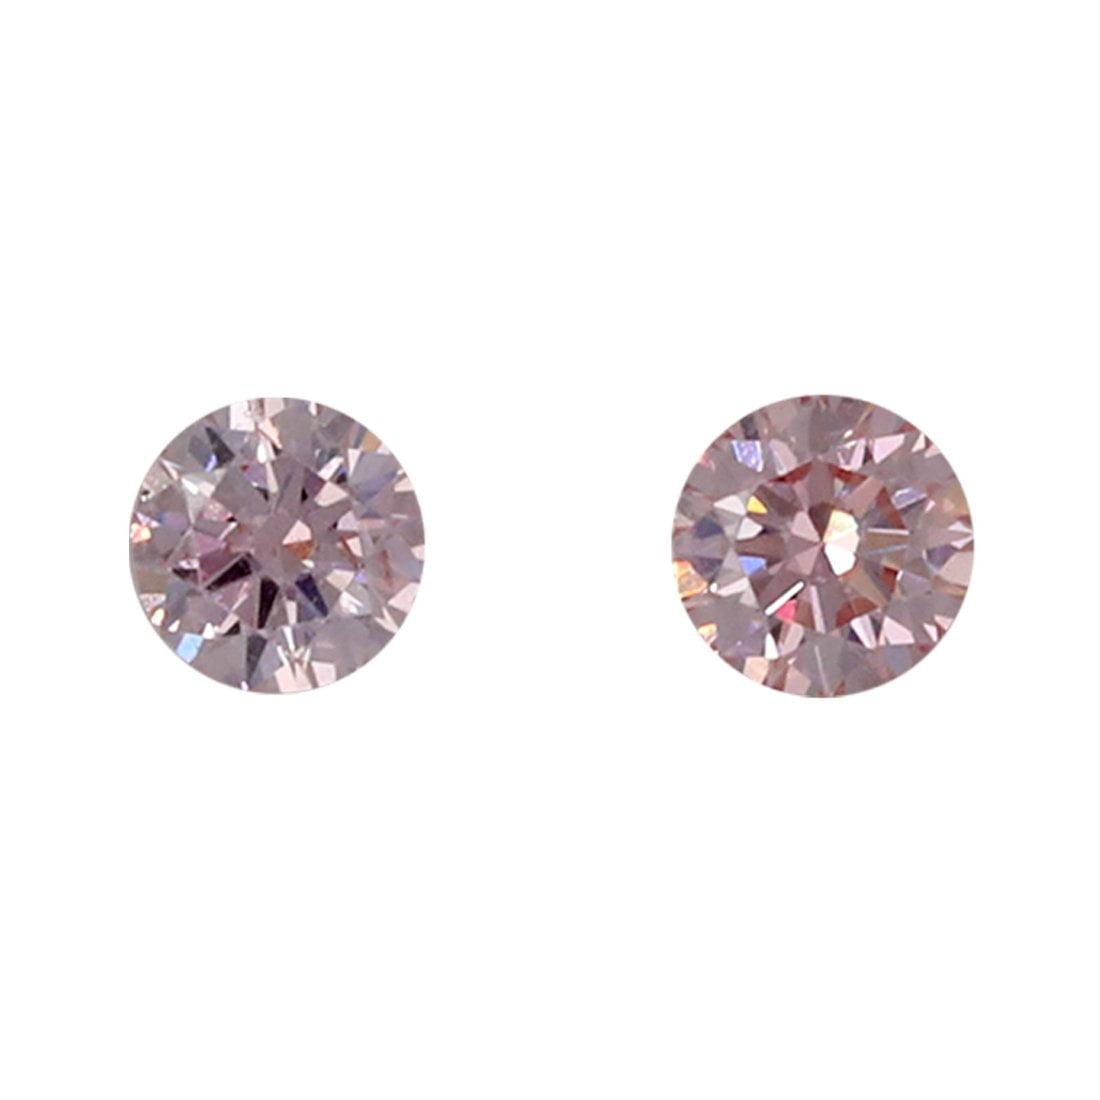 2=0.09ct Natural Fancy Pink, 6P Argyle Diamond